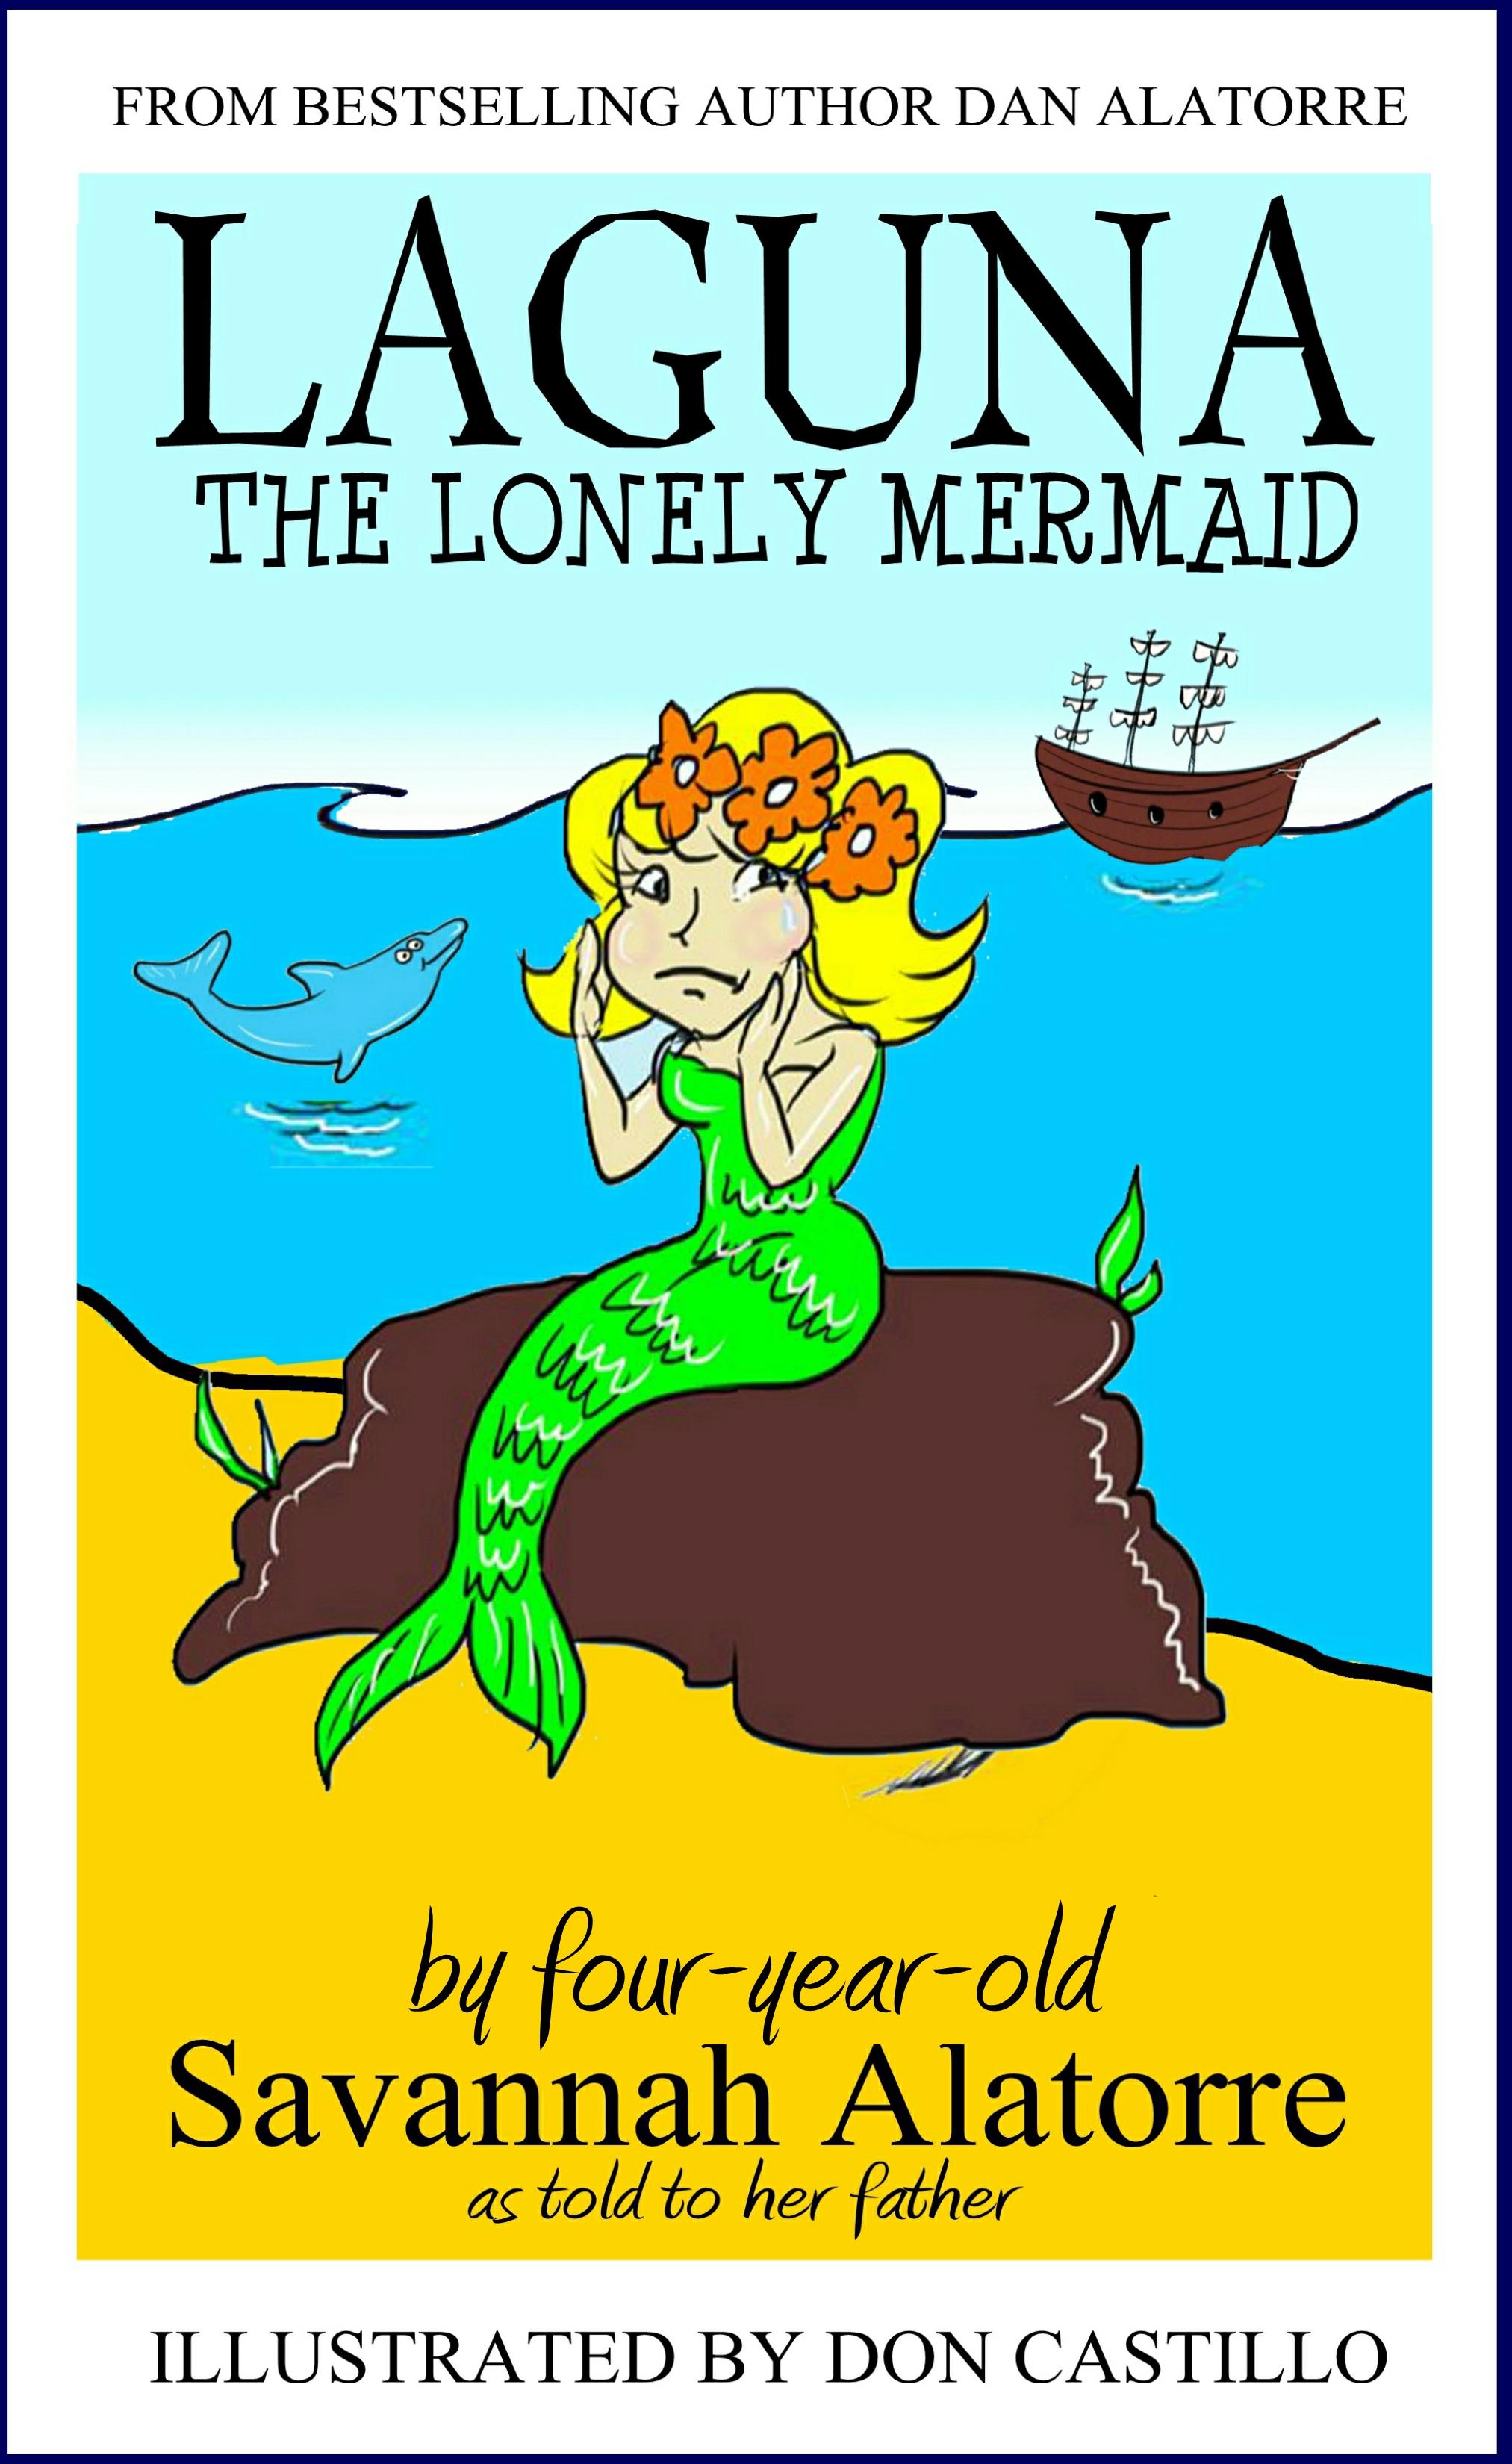 Laguna the lonely mermaid